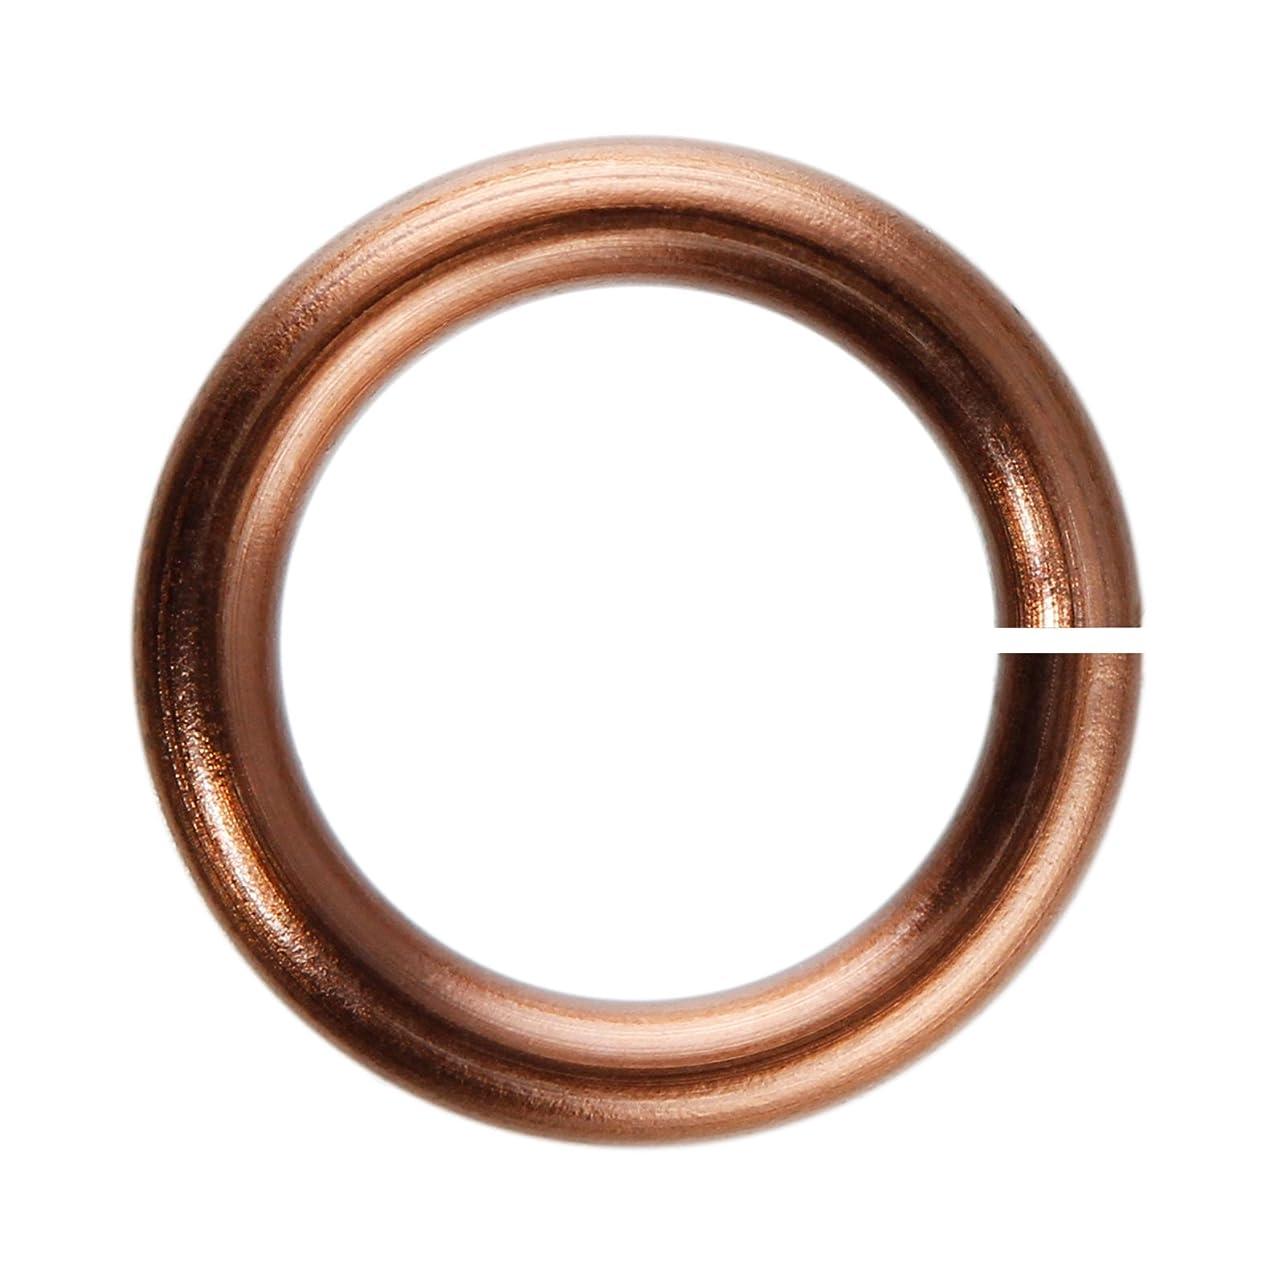 18-Gauge 6mm Antique Copper Enameled Copper Jump Rings - 1 ounce